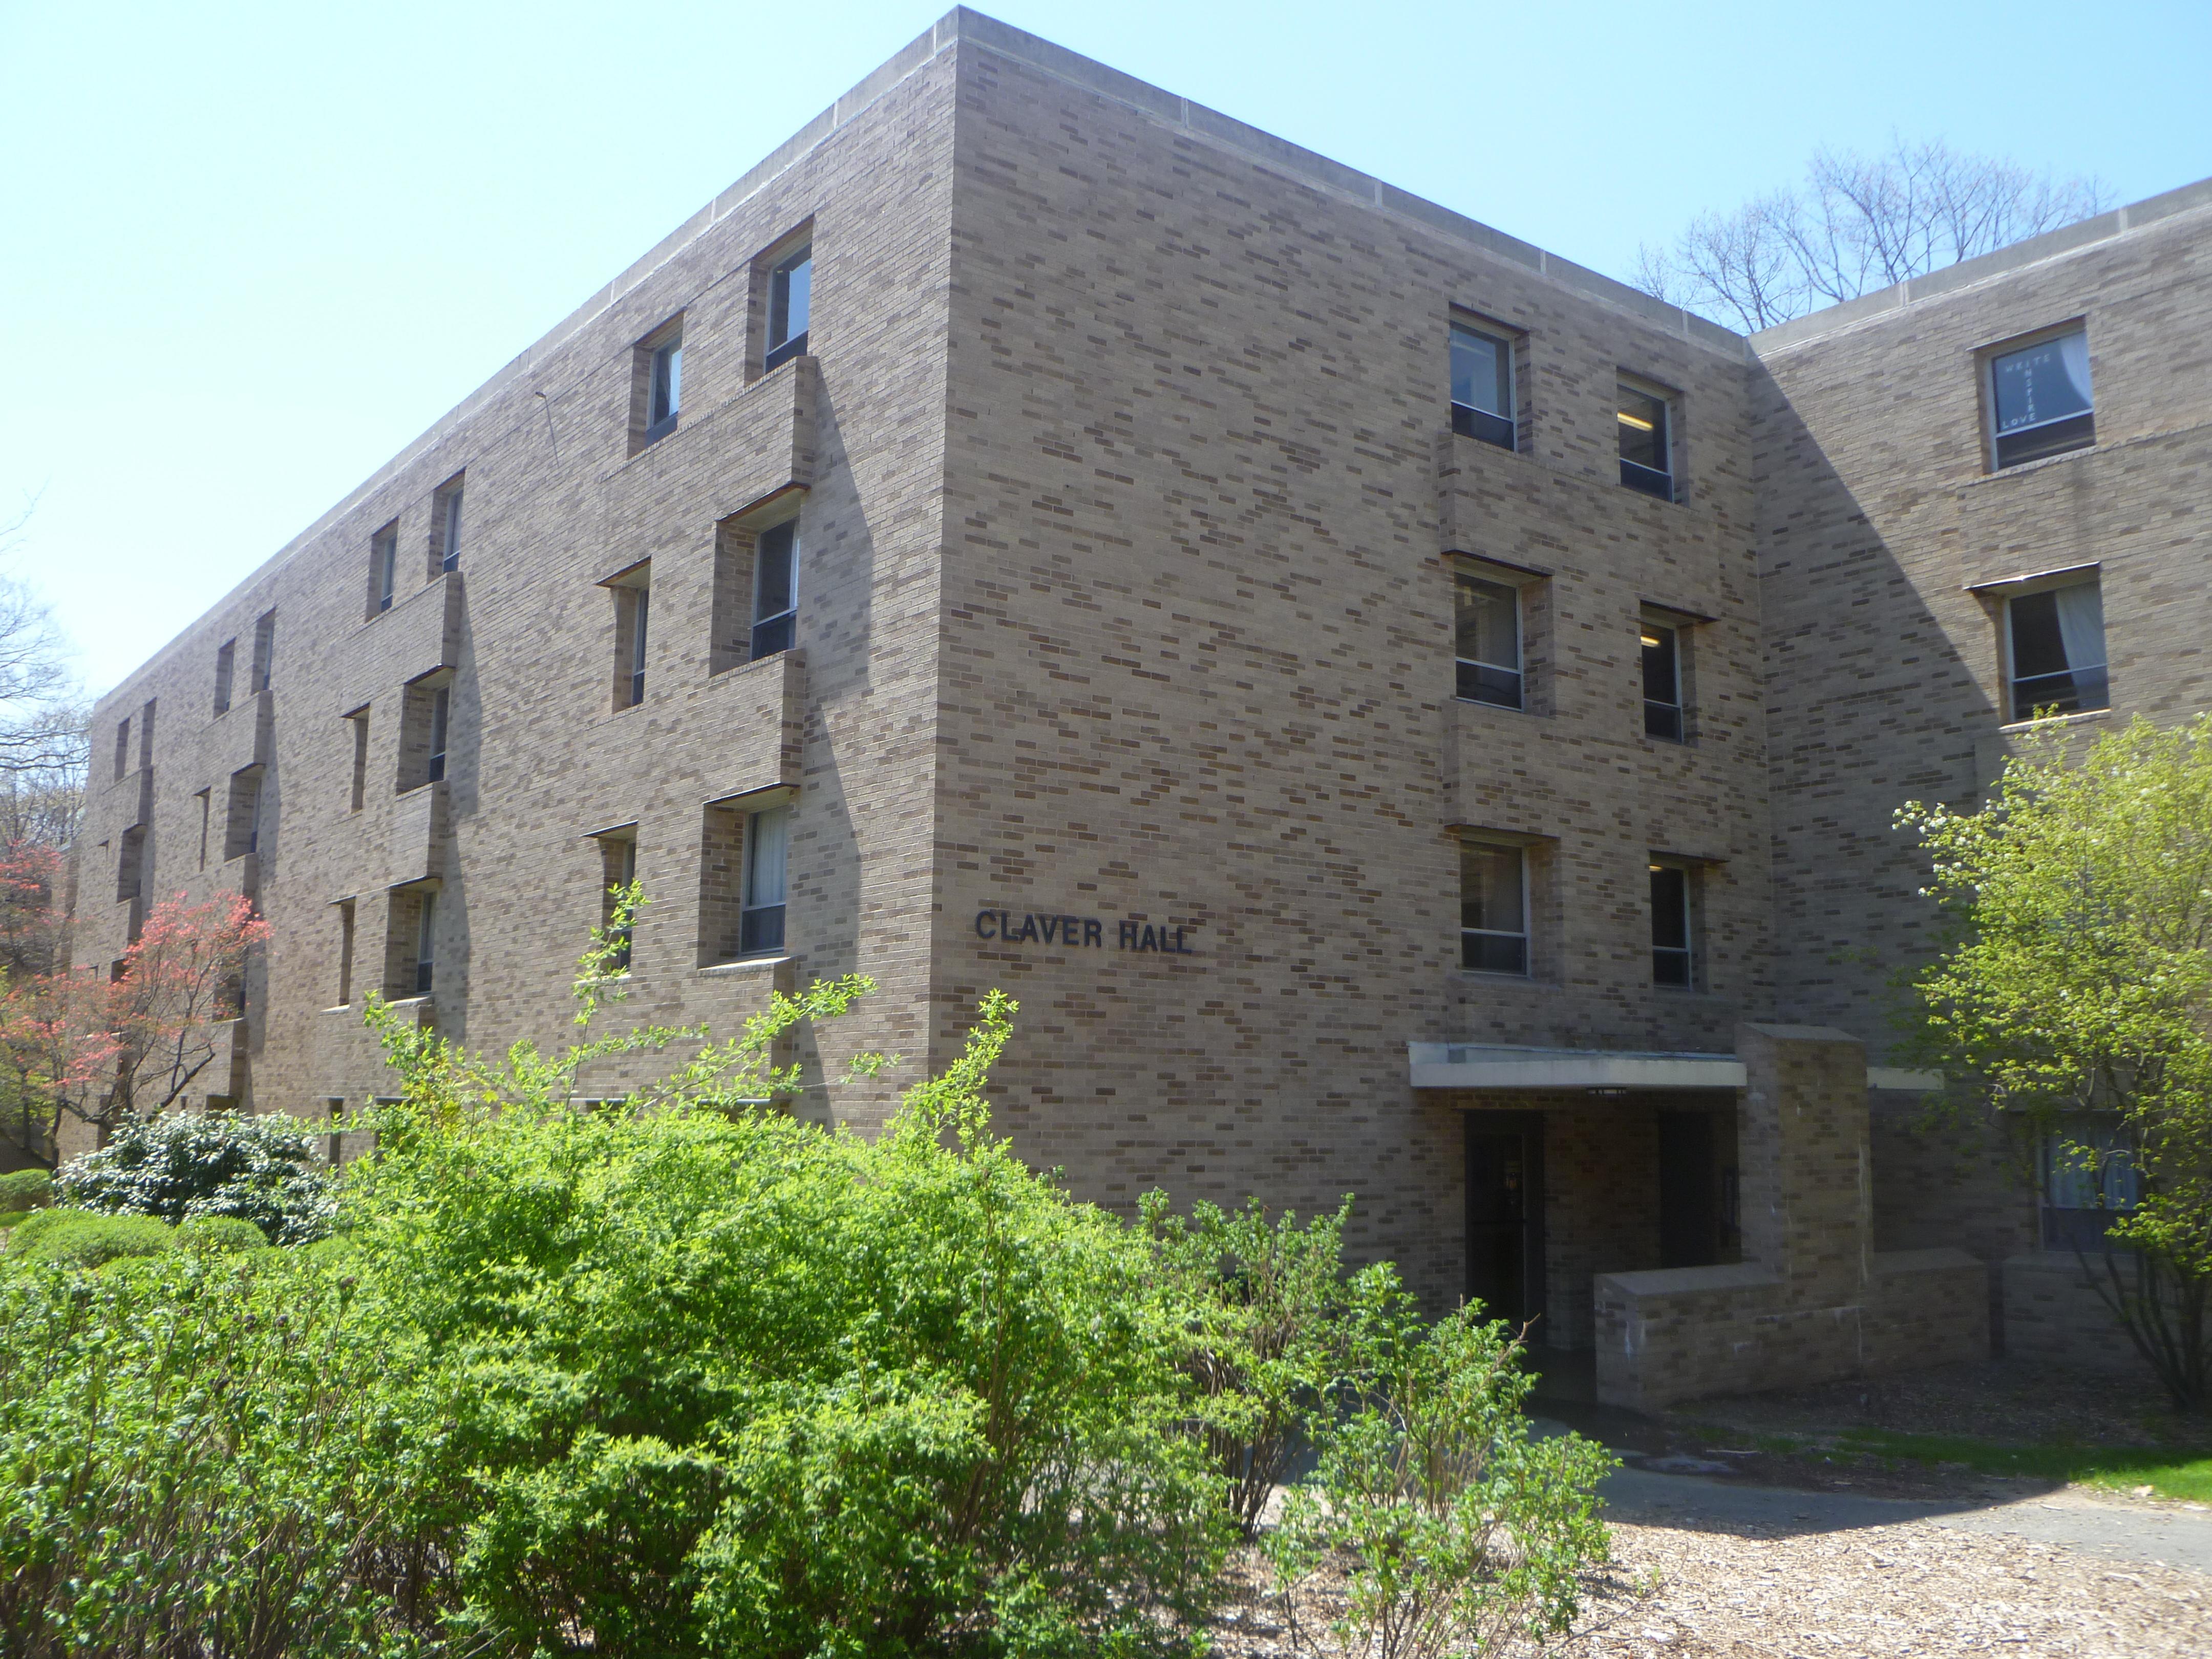 Boston university claver hall